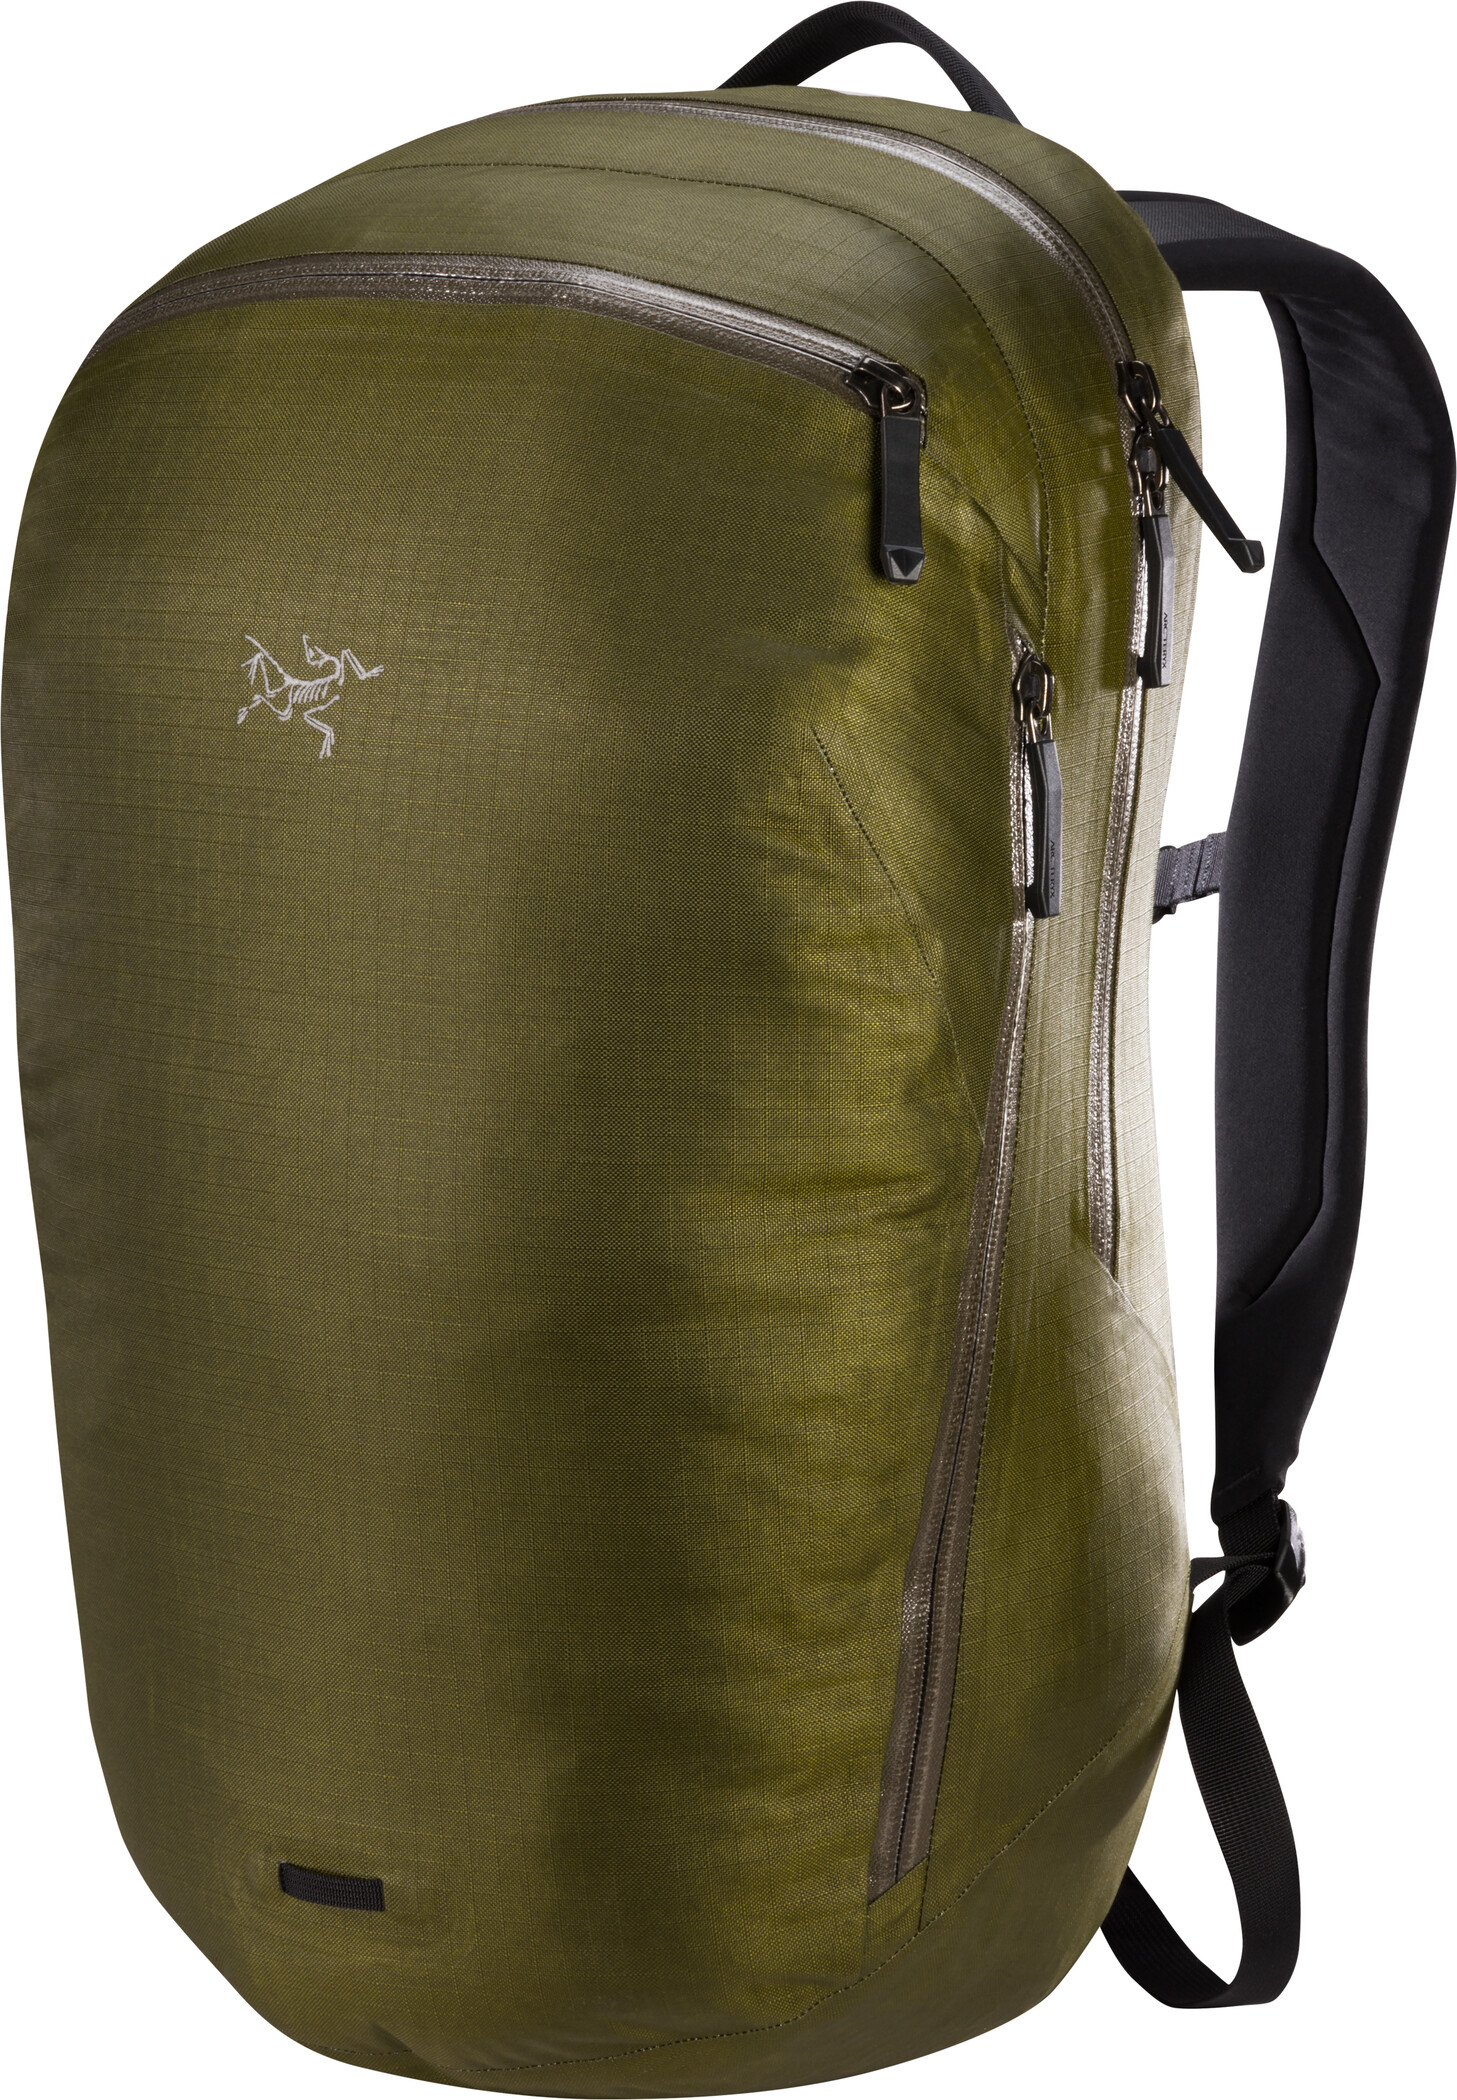 Arc'teryx Granville Zip 16 Rygsæk, bushwhack (2019)   Travel bags